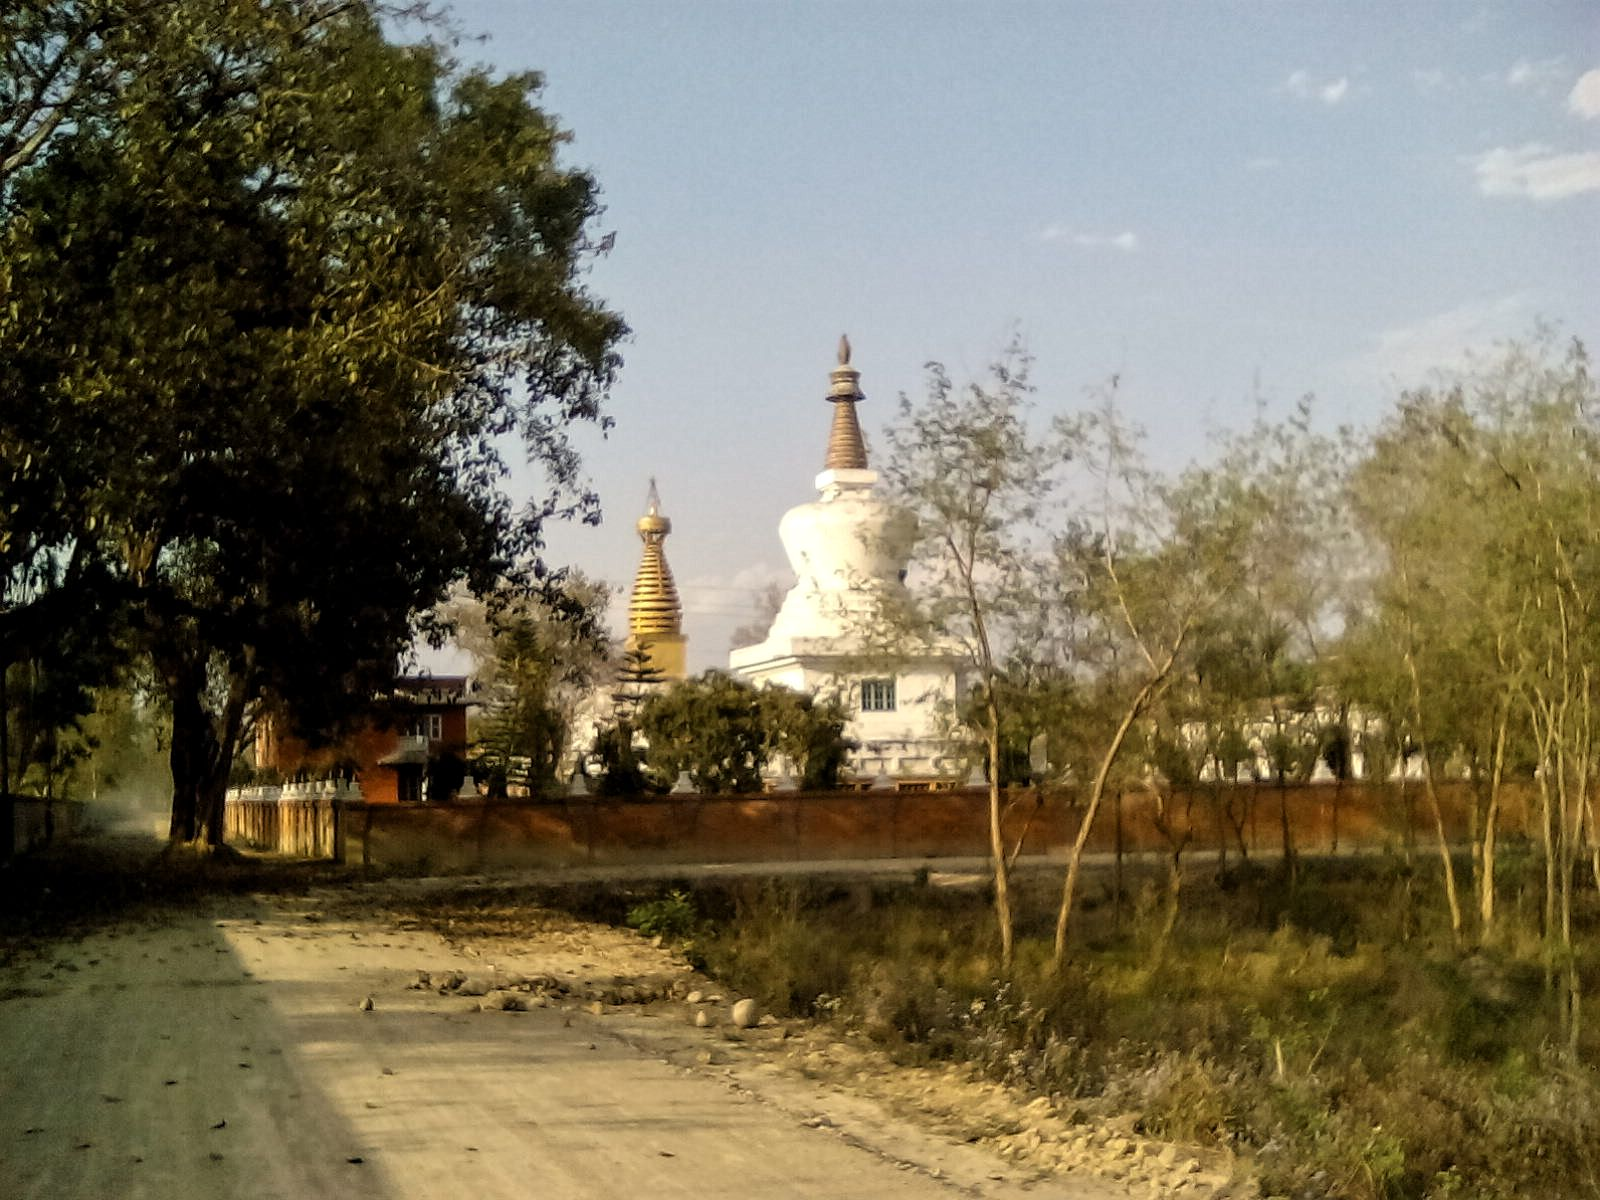 stuppa nepal lumbini temple bouddha vie nomade culture visite